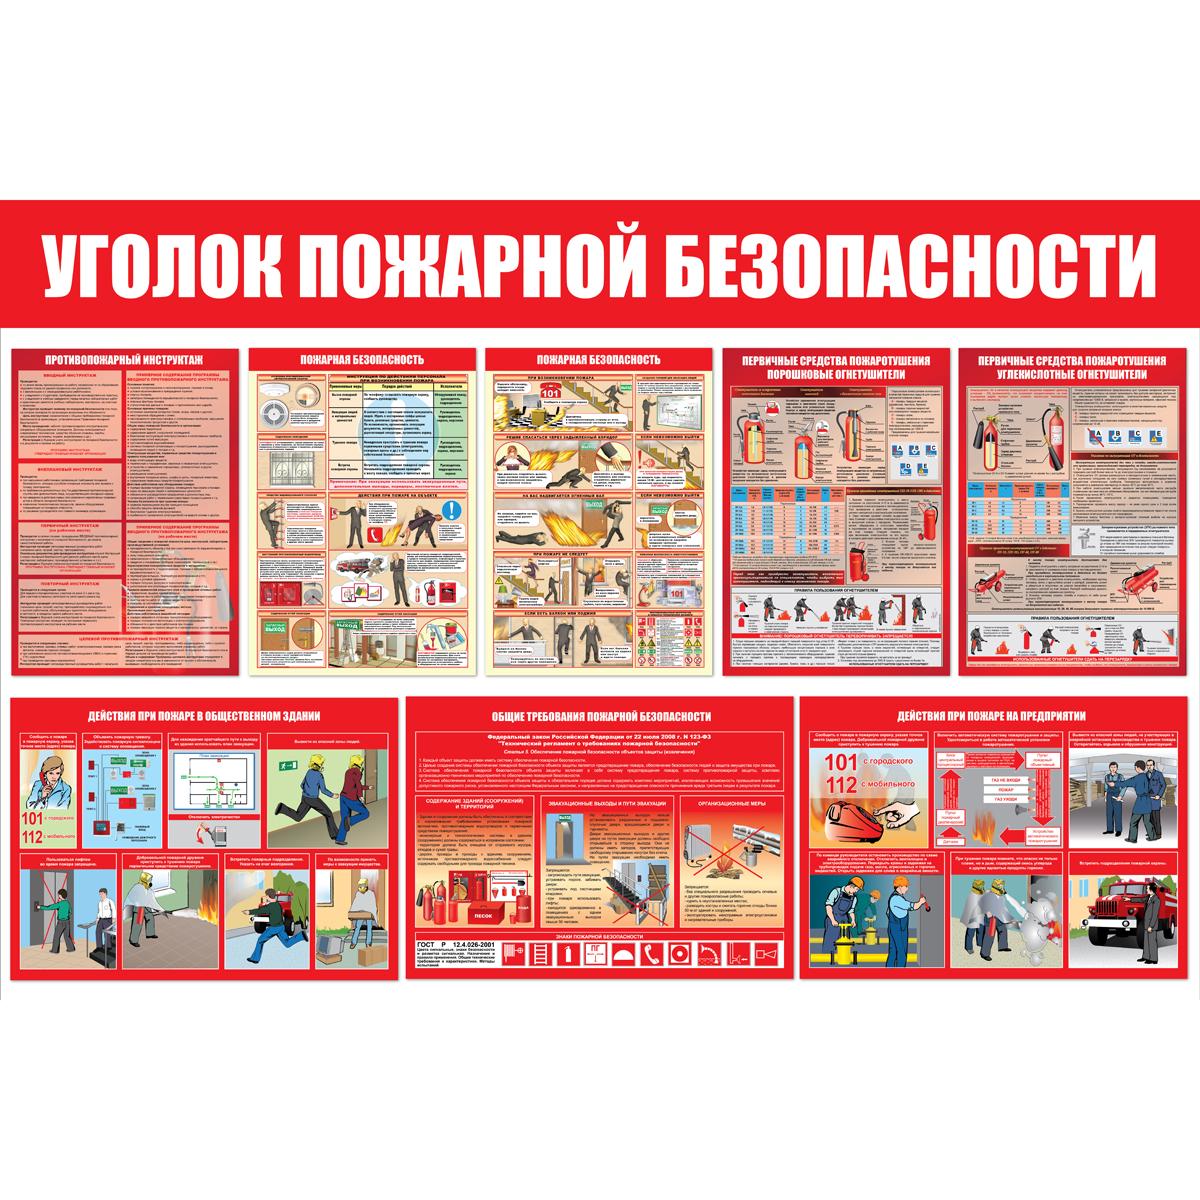 Уголок пожарной безопасности, пластик 3 мм, 1000х1500 мм.1